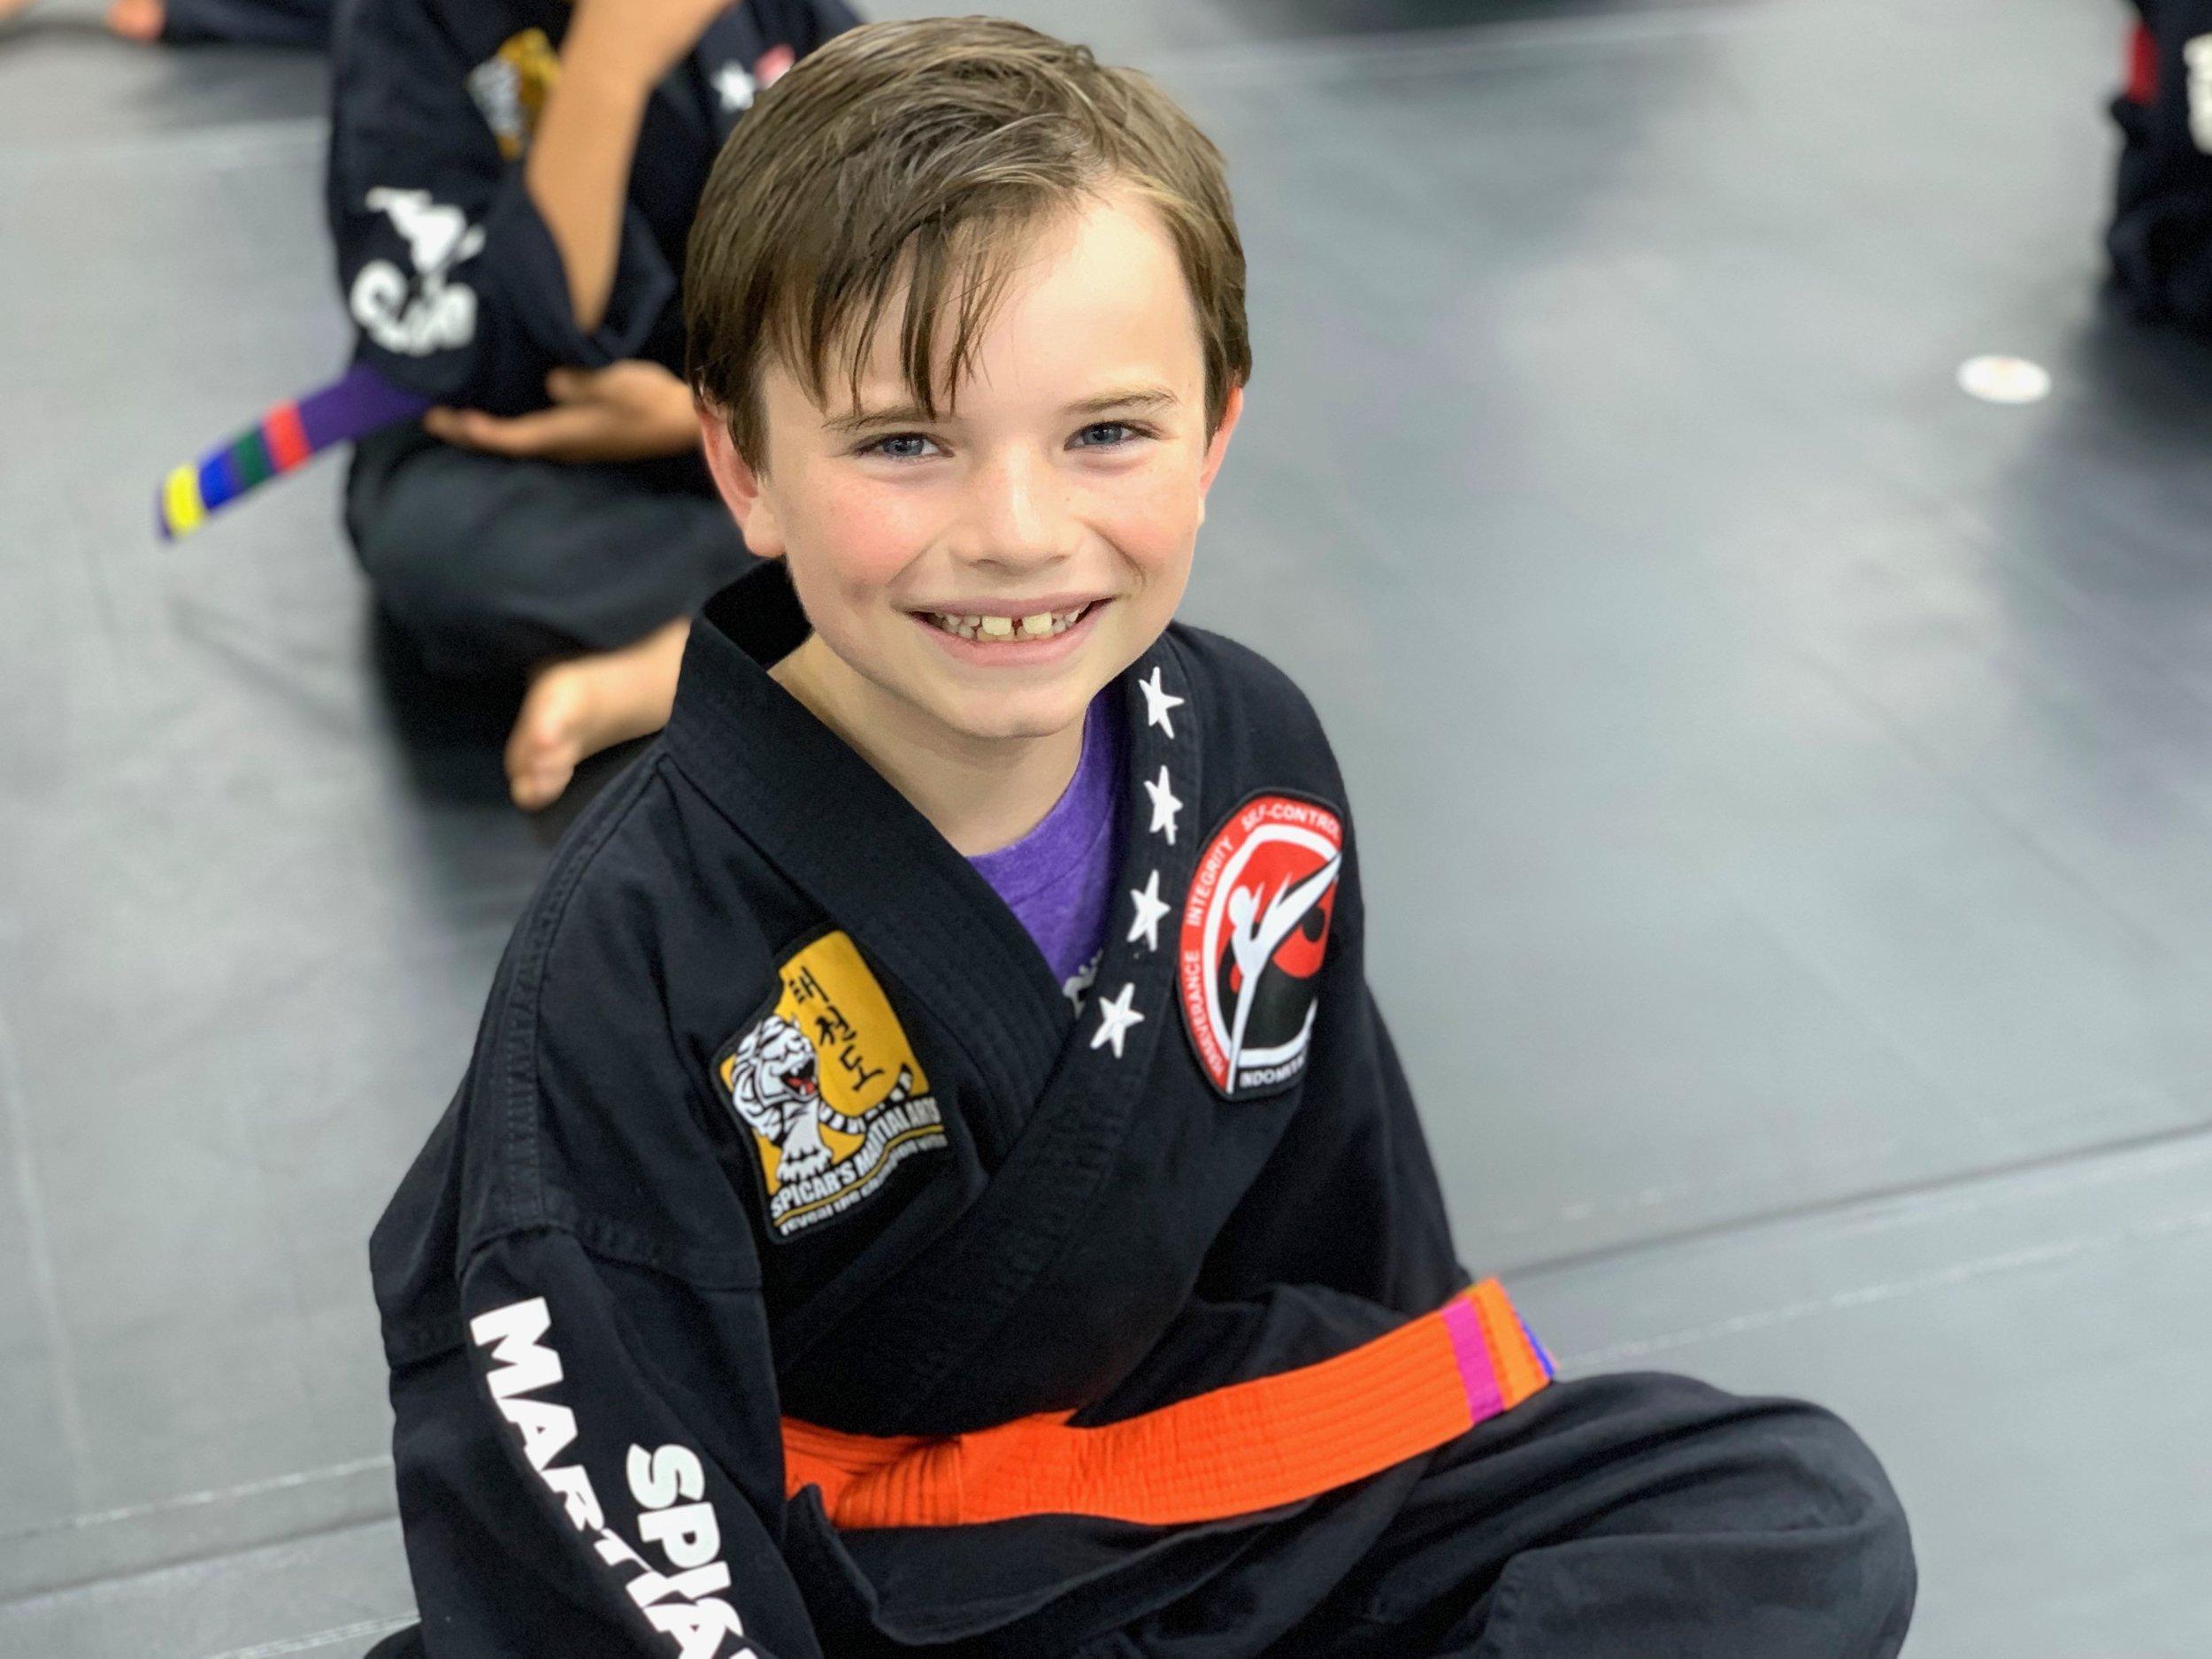 karate-kids-program-souhtlake-keller-grapevine-texas00045.jpeg